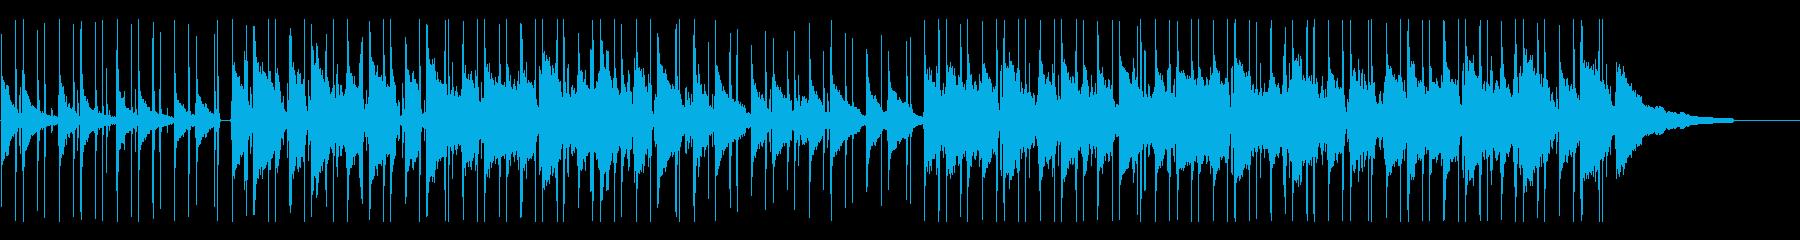 Lo-Fiヒップホップ、Jazzテイストの再生済みの波形